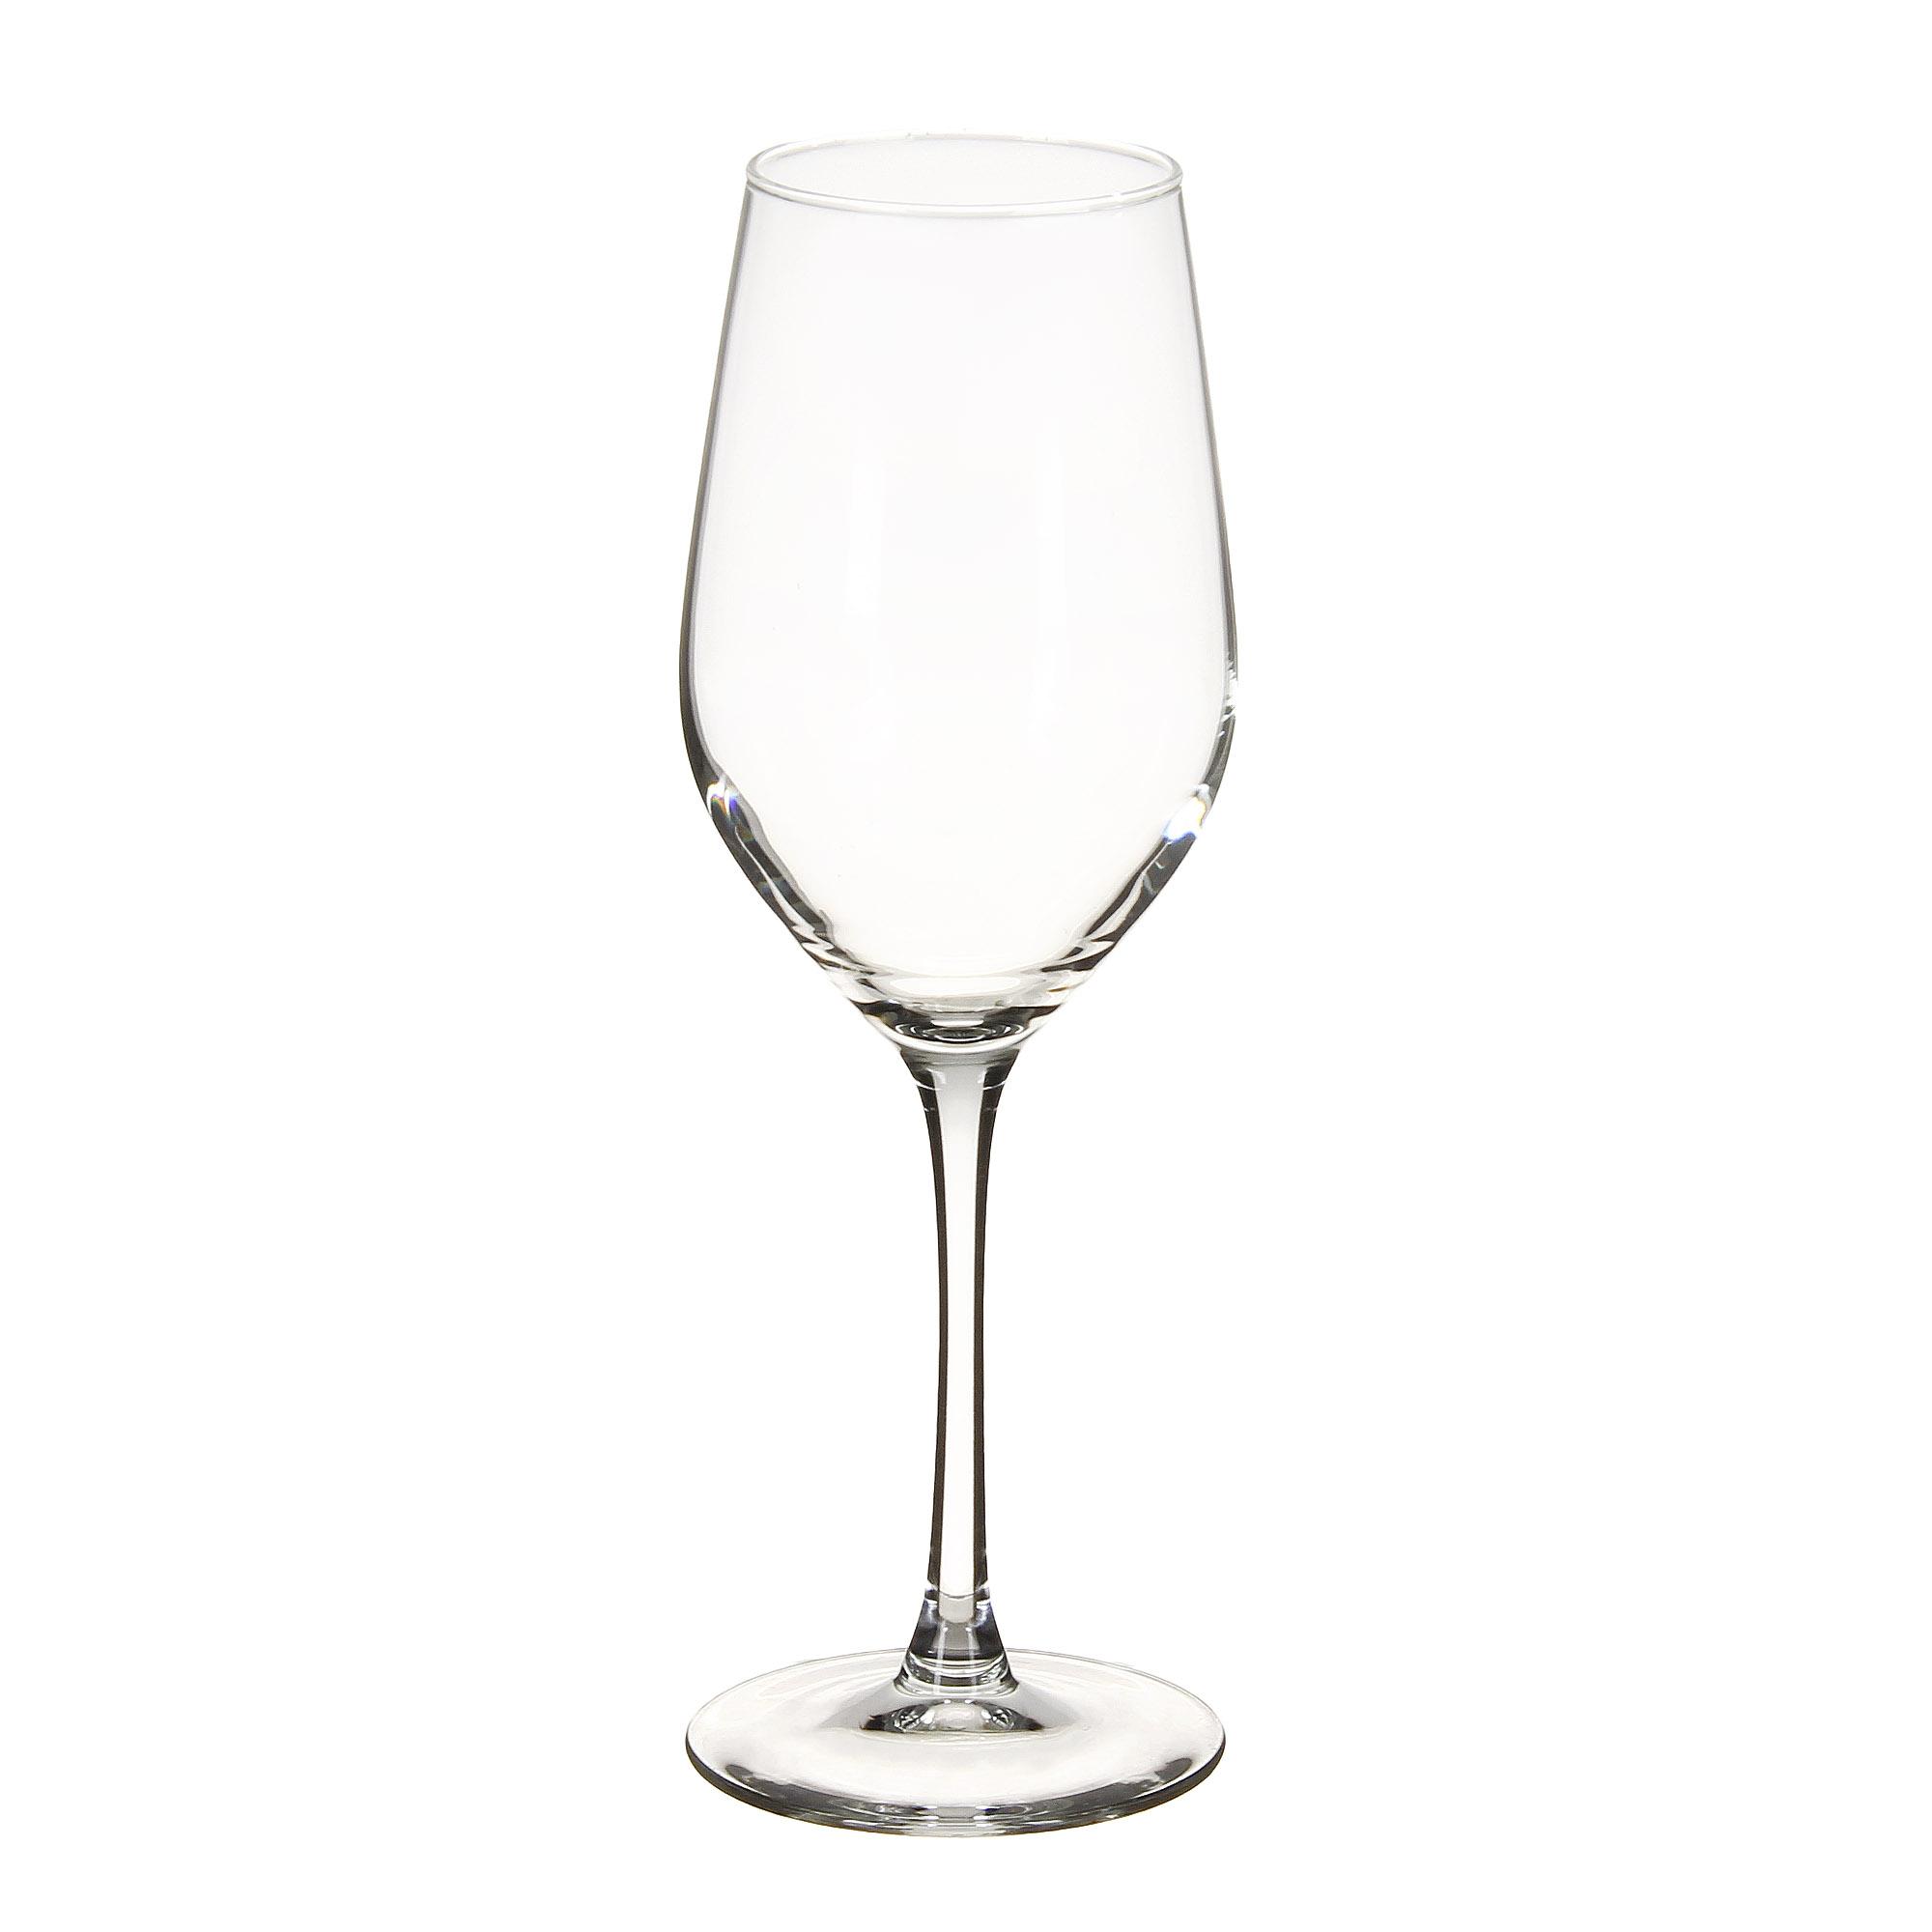 Фото - Набор бокалов для вина Luminarc селест 450мл 6шт набор бокалов для вина luminarc версаль 6шт 275мл g1509